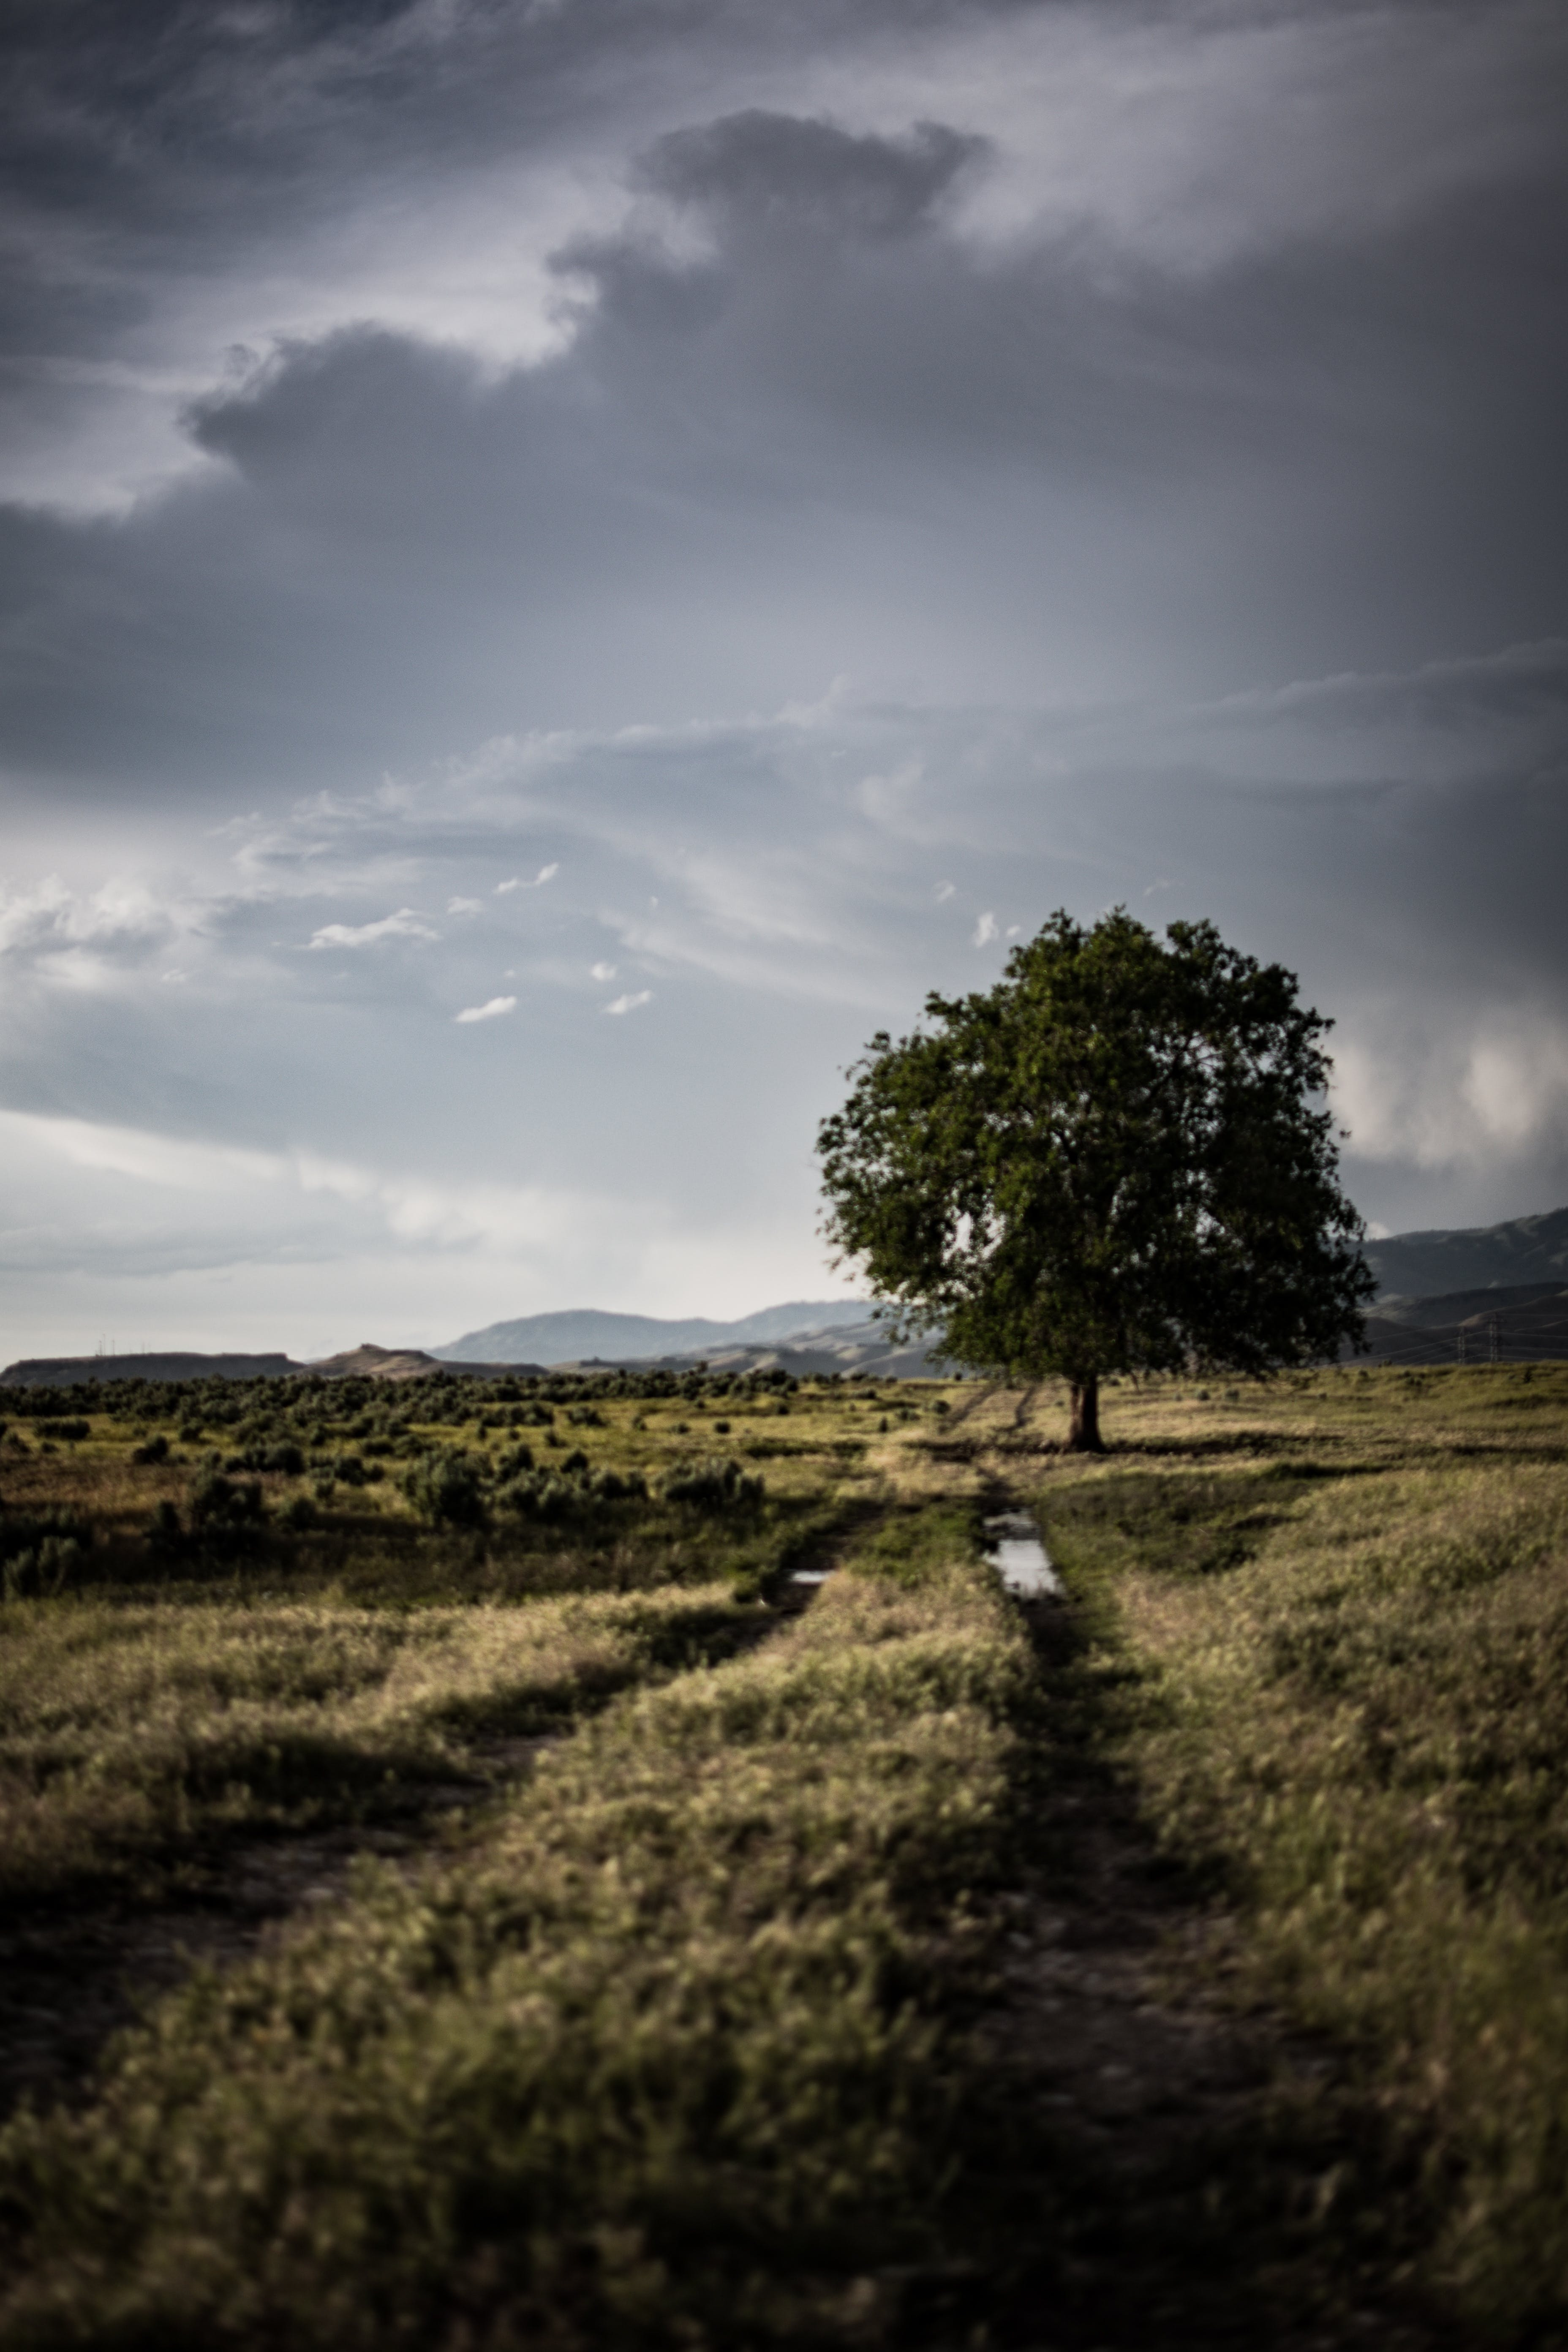 Lone Tree on Grass Field Under Cloudy Sky